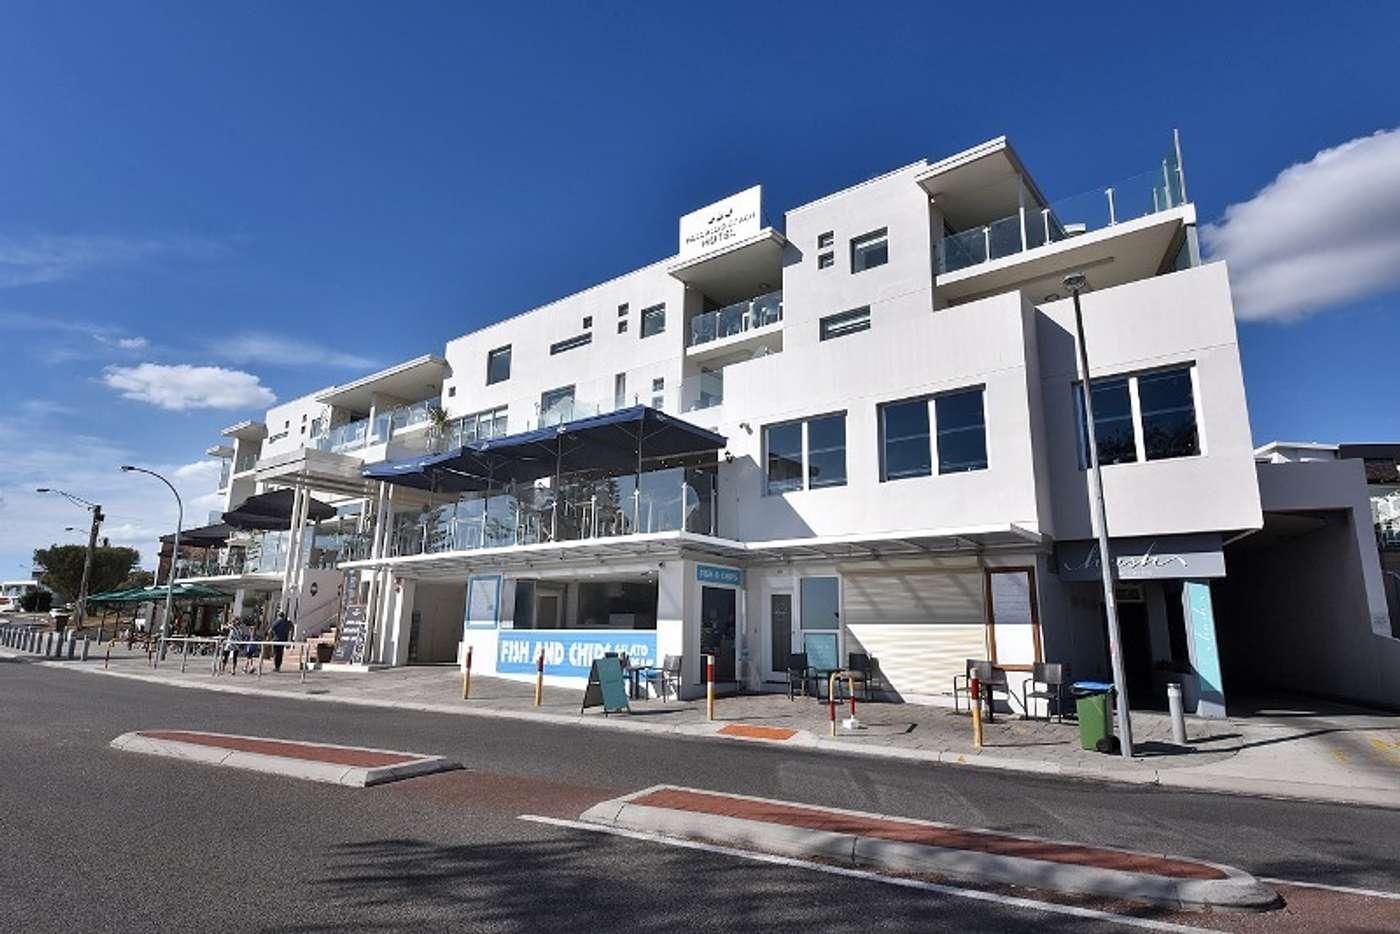 Main view of Homely apartment listing, 1/10 Oceanside Promenade, Mullaloo WA 6027